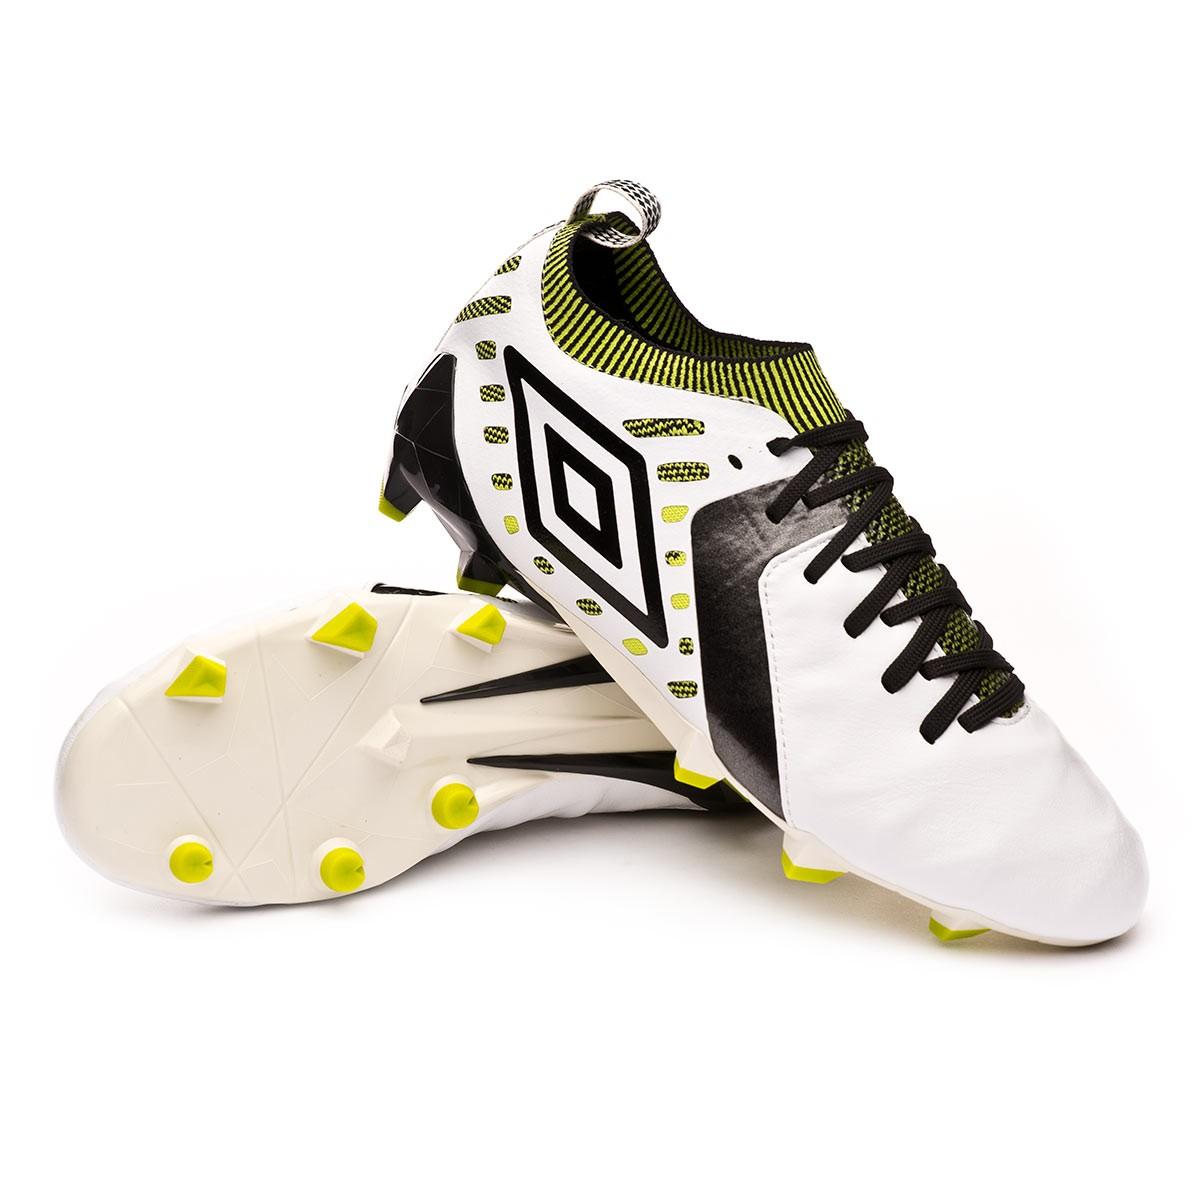 umbro leather football boots